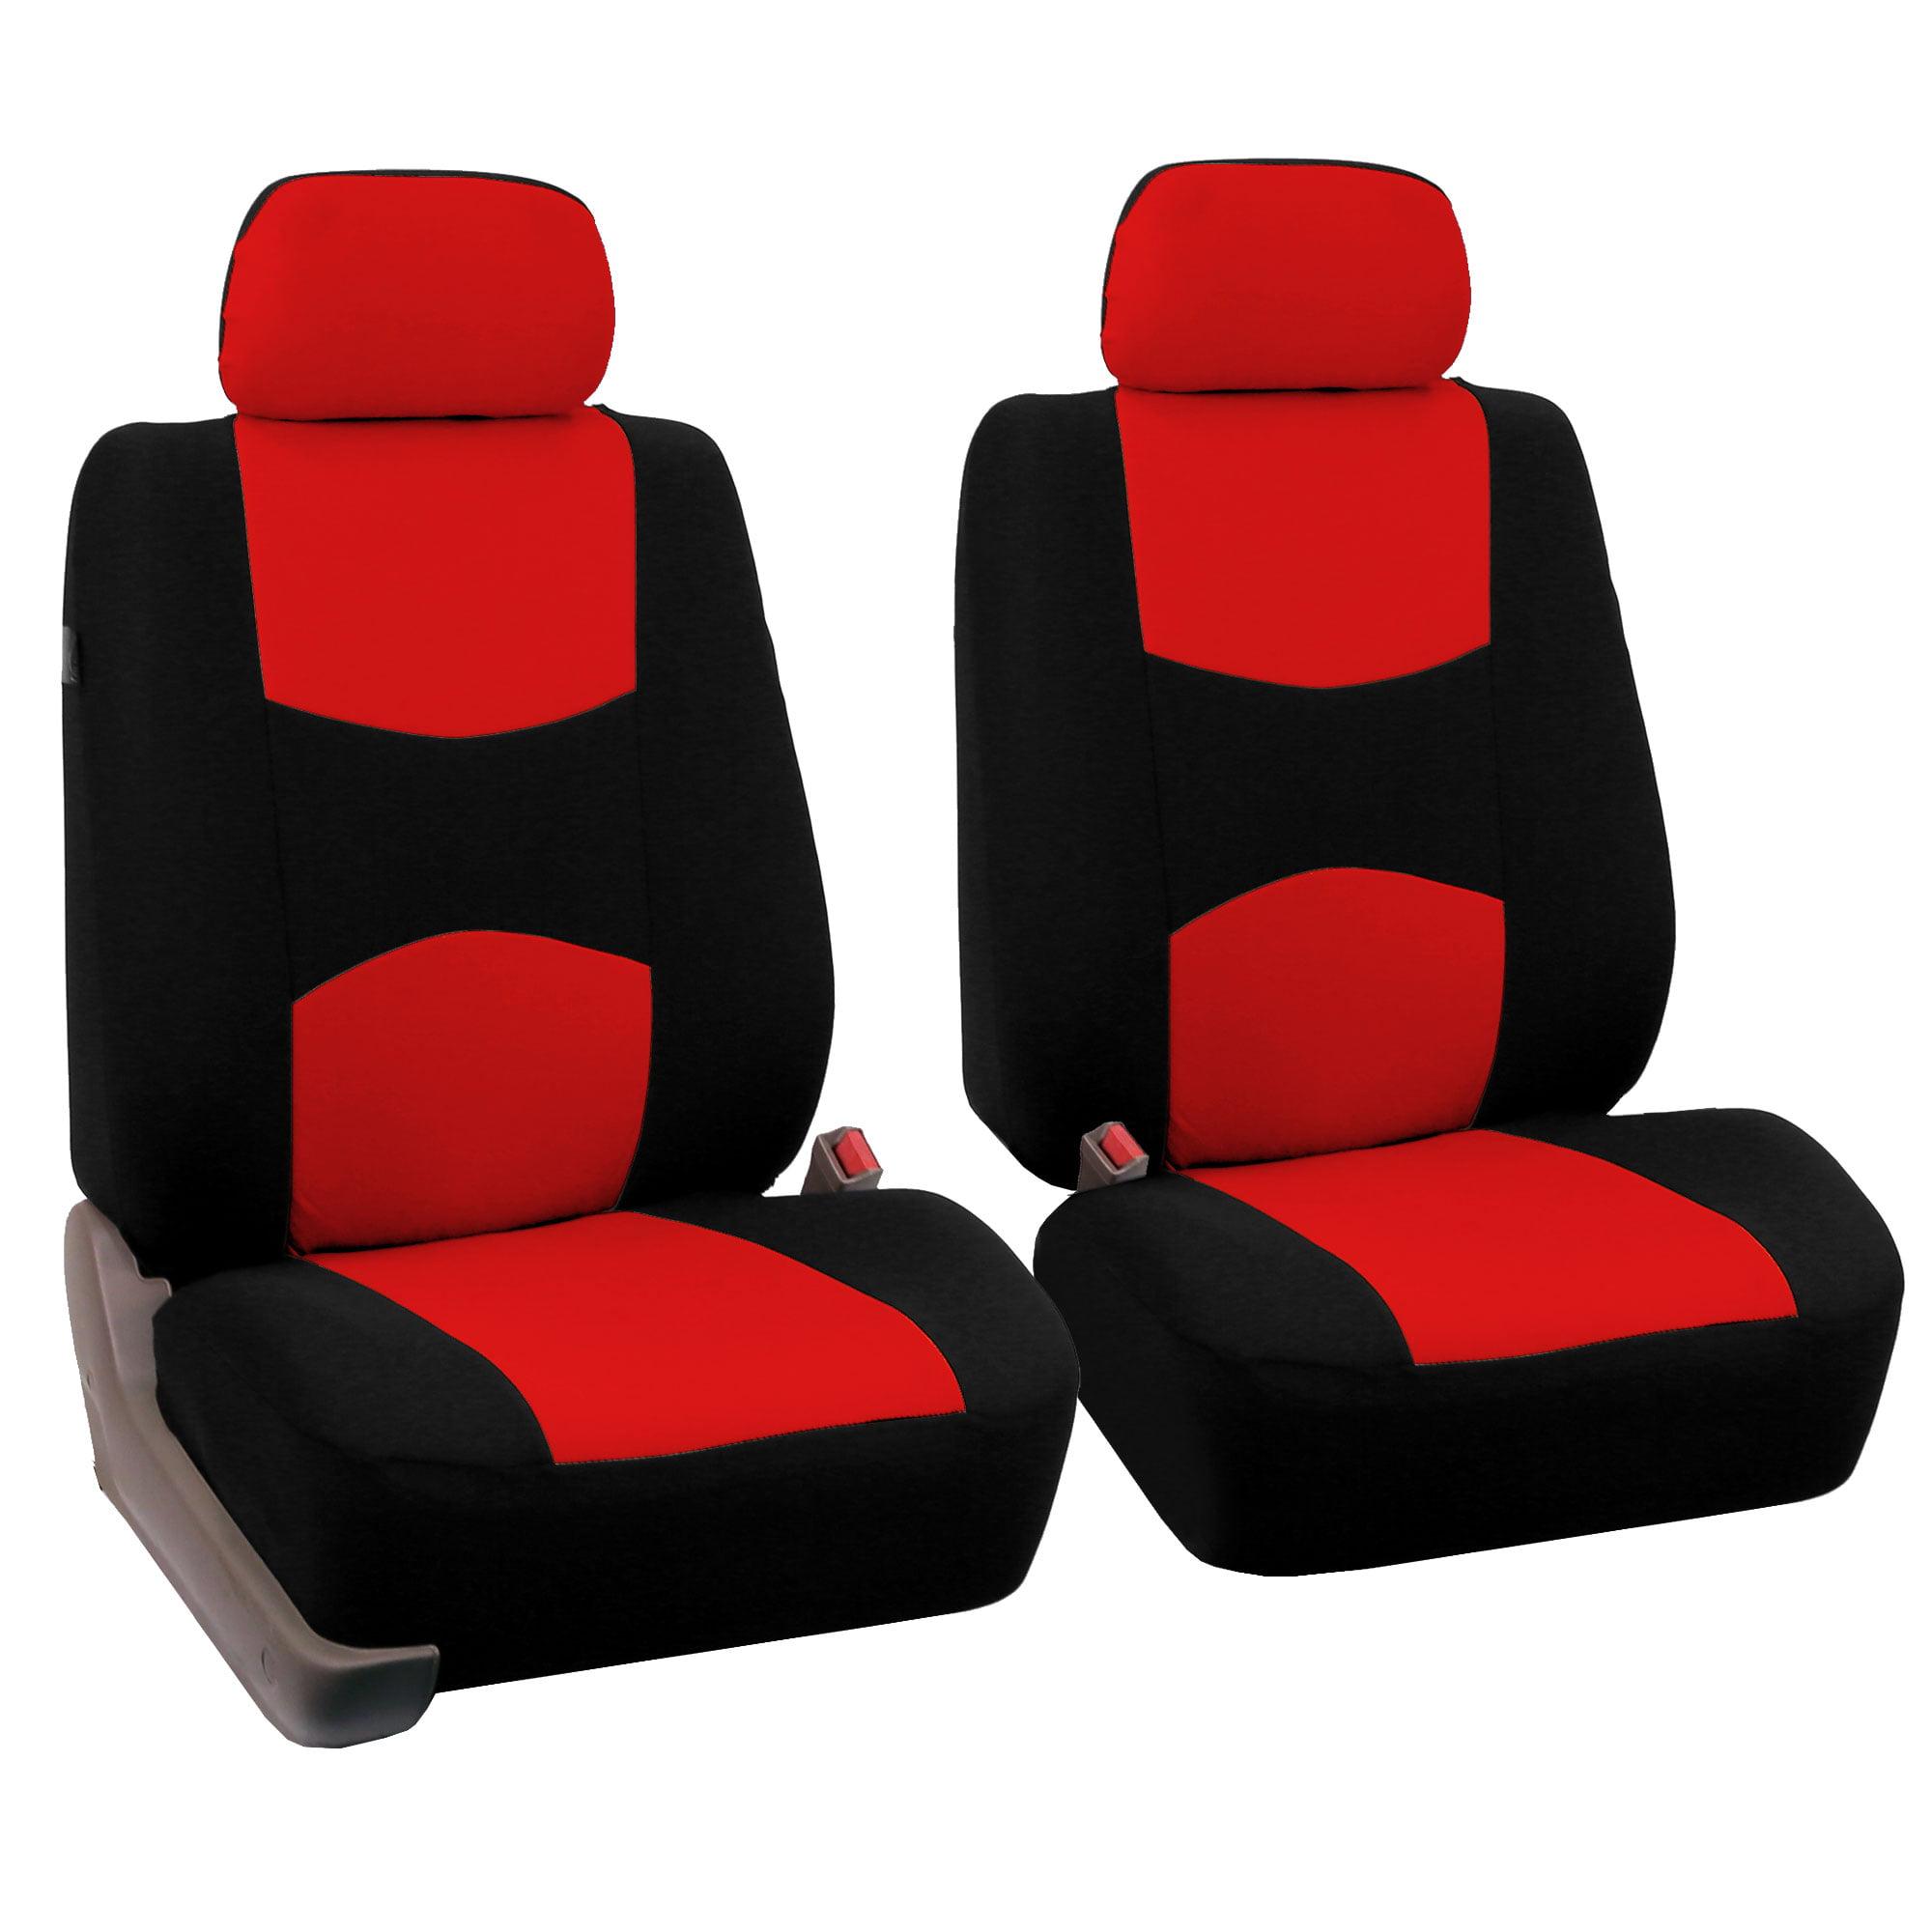 CAR SEAT COVERS full set fit Skoda Fabia leatherette Eco leather black